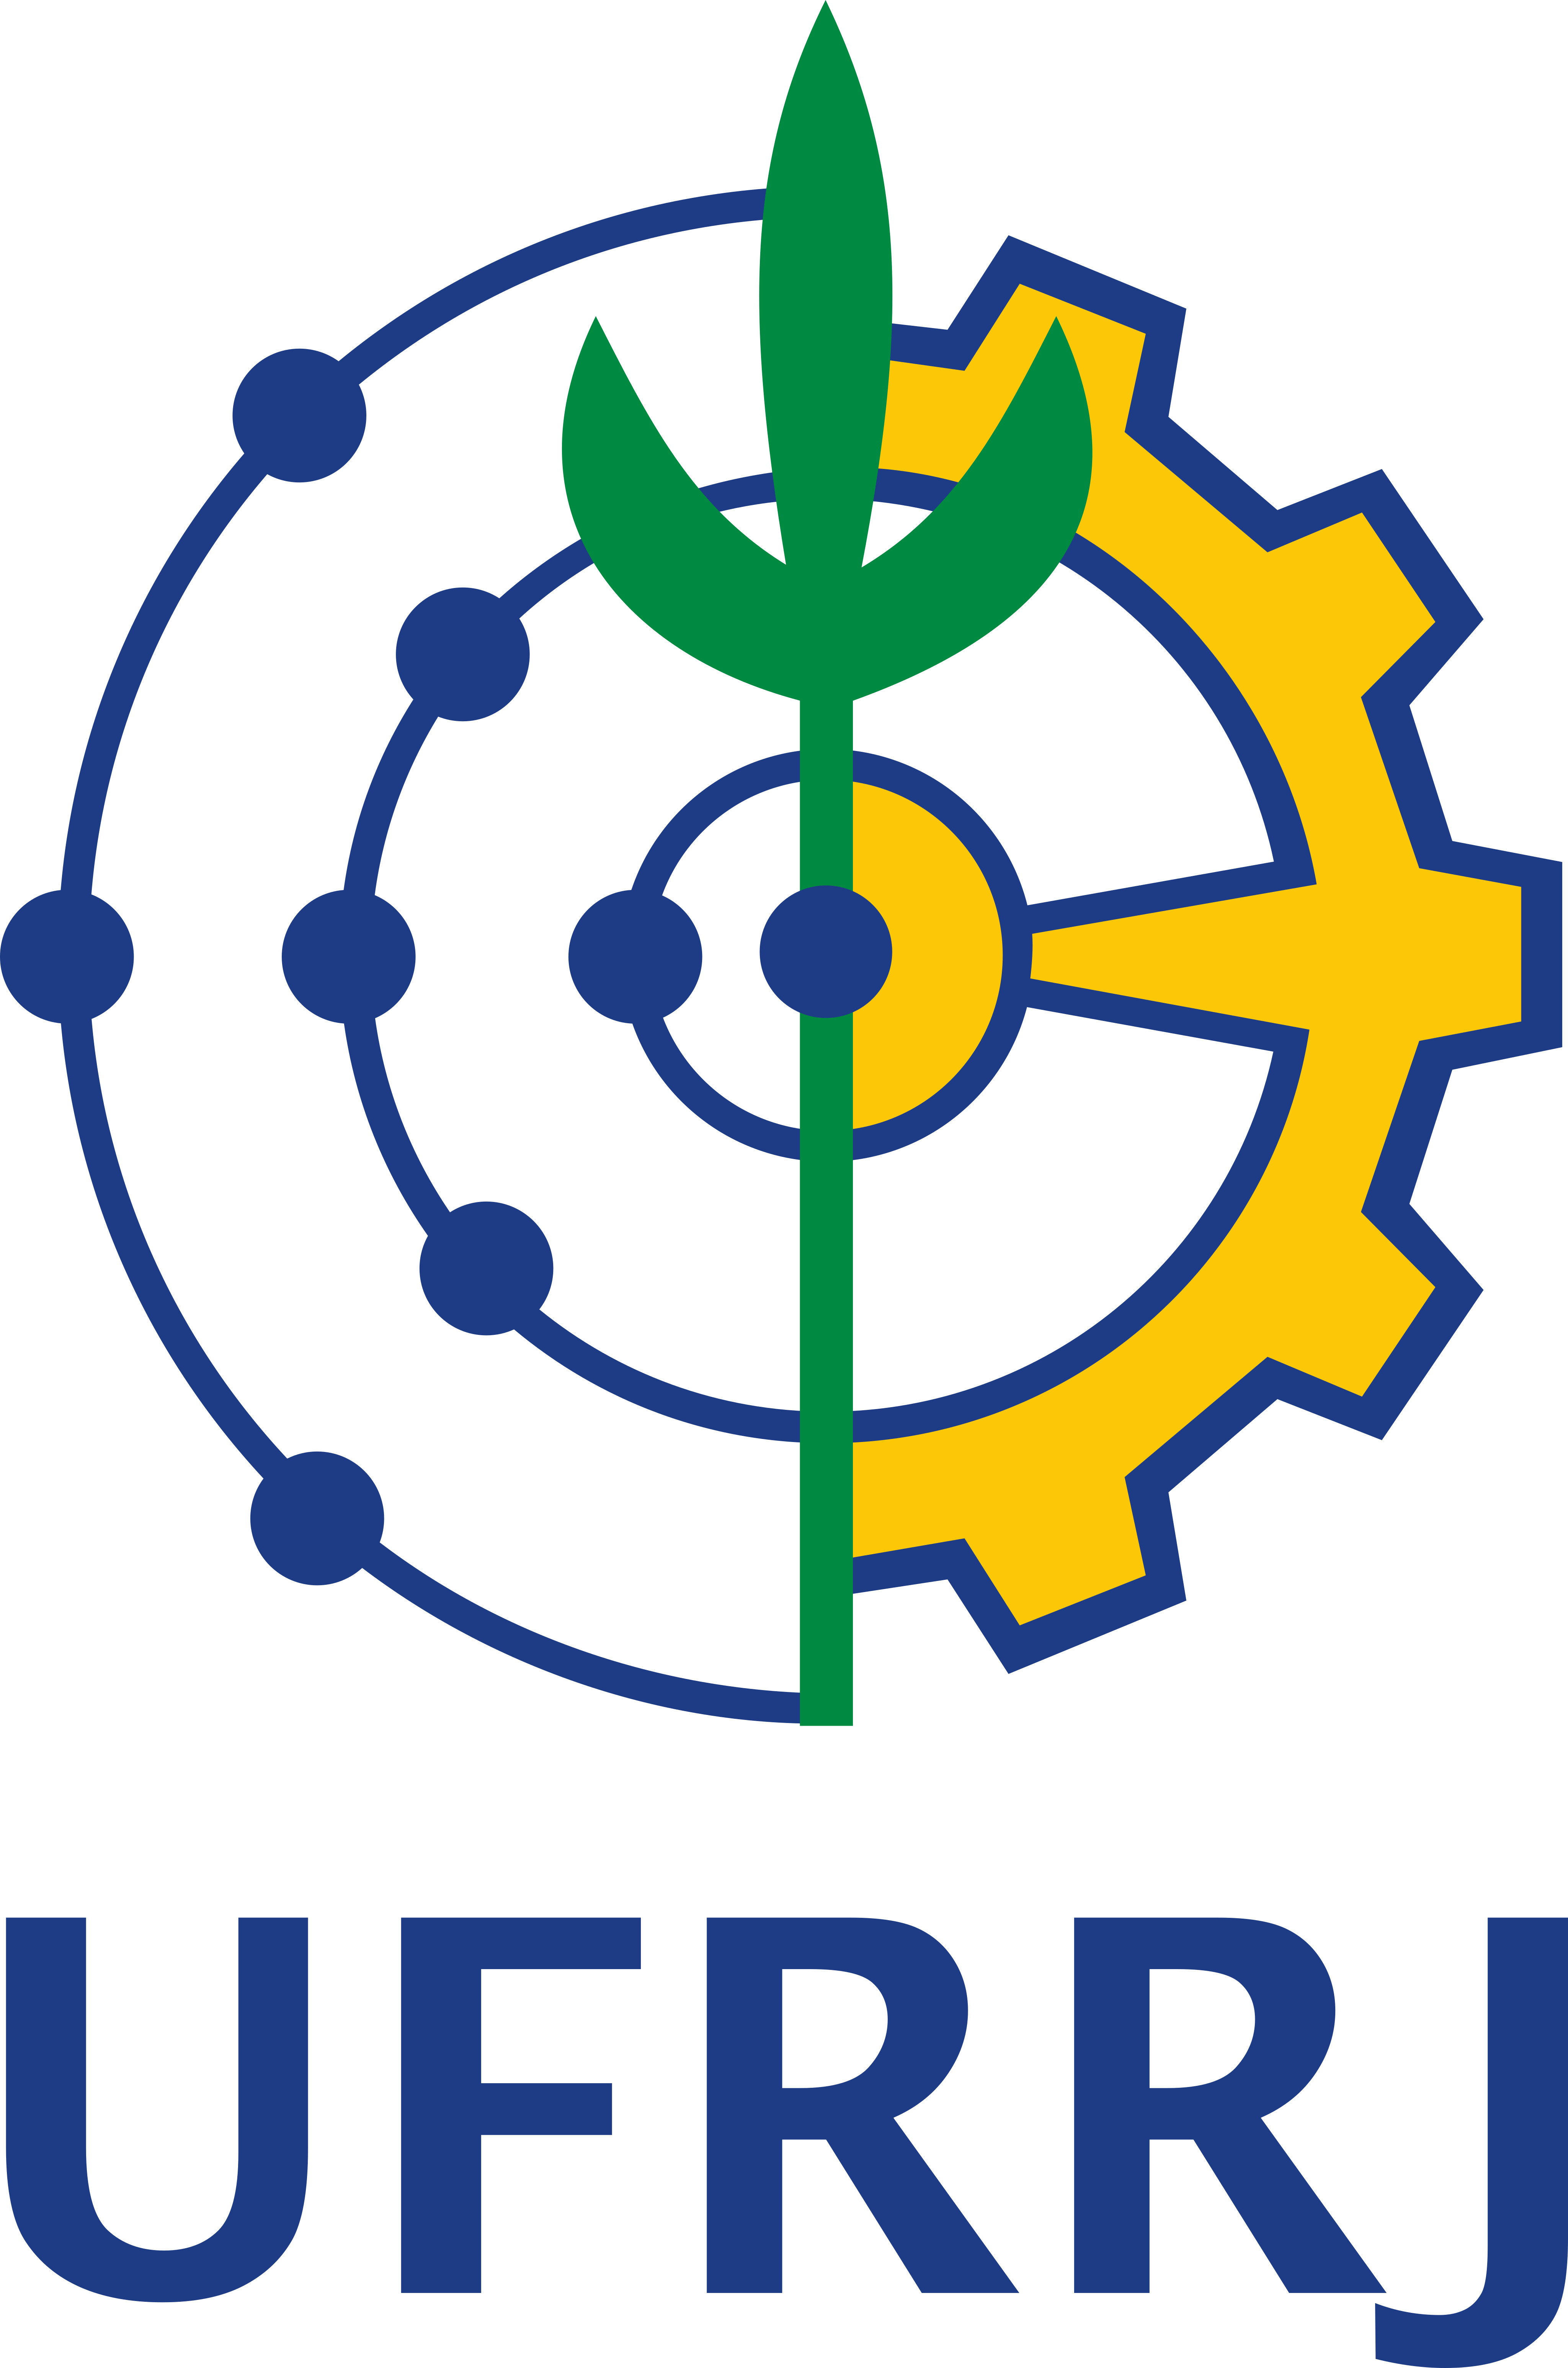 UFRRJ Logo.